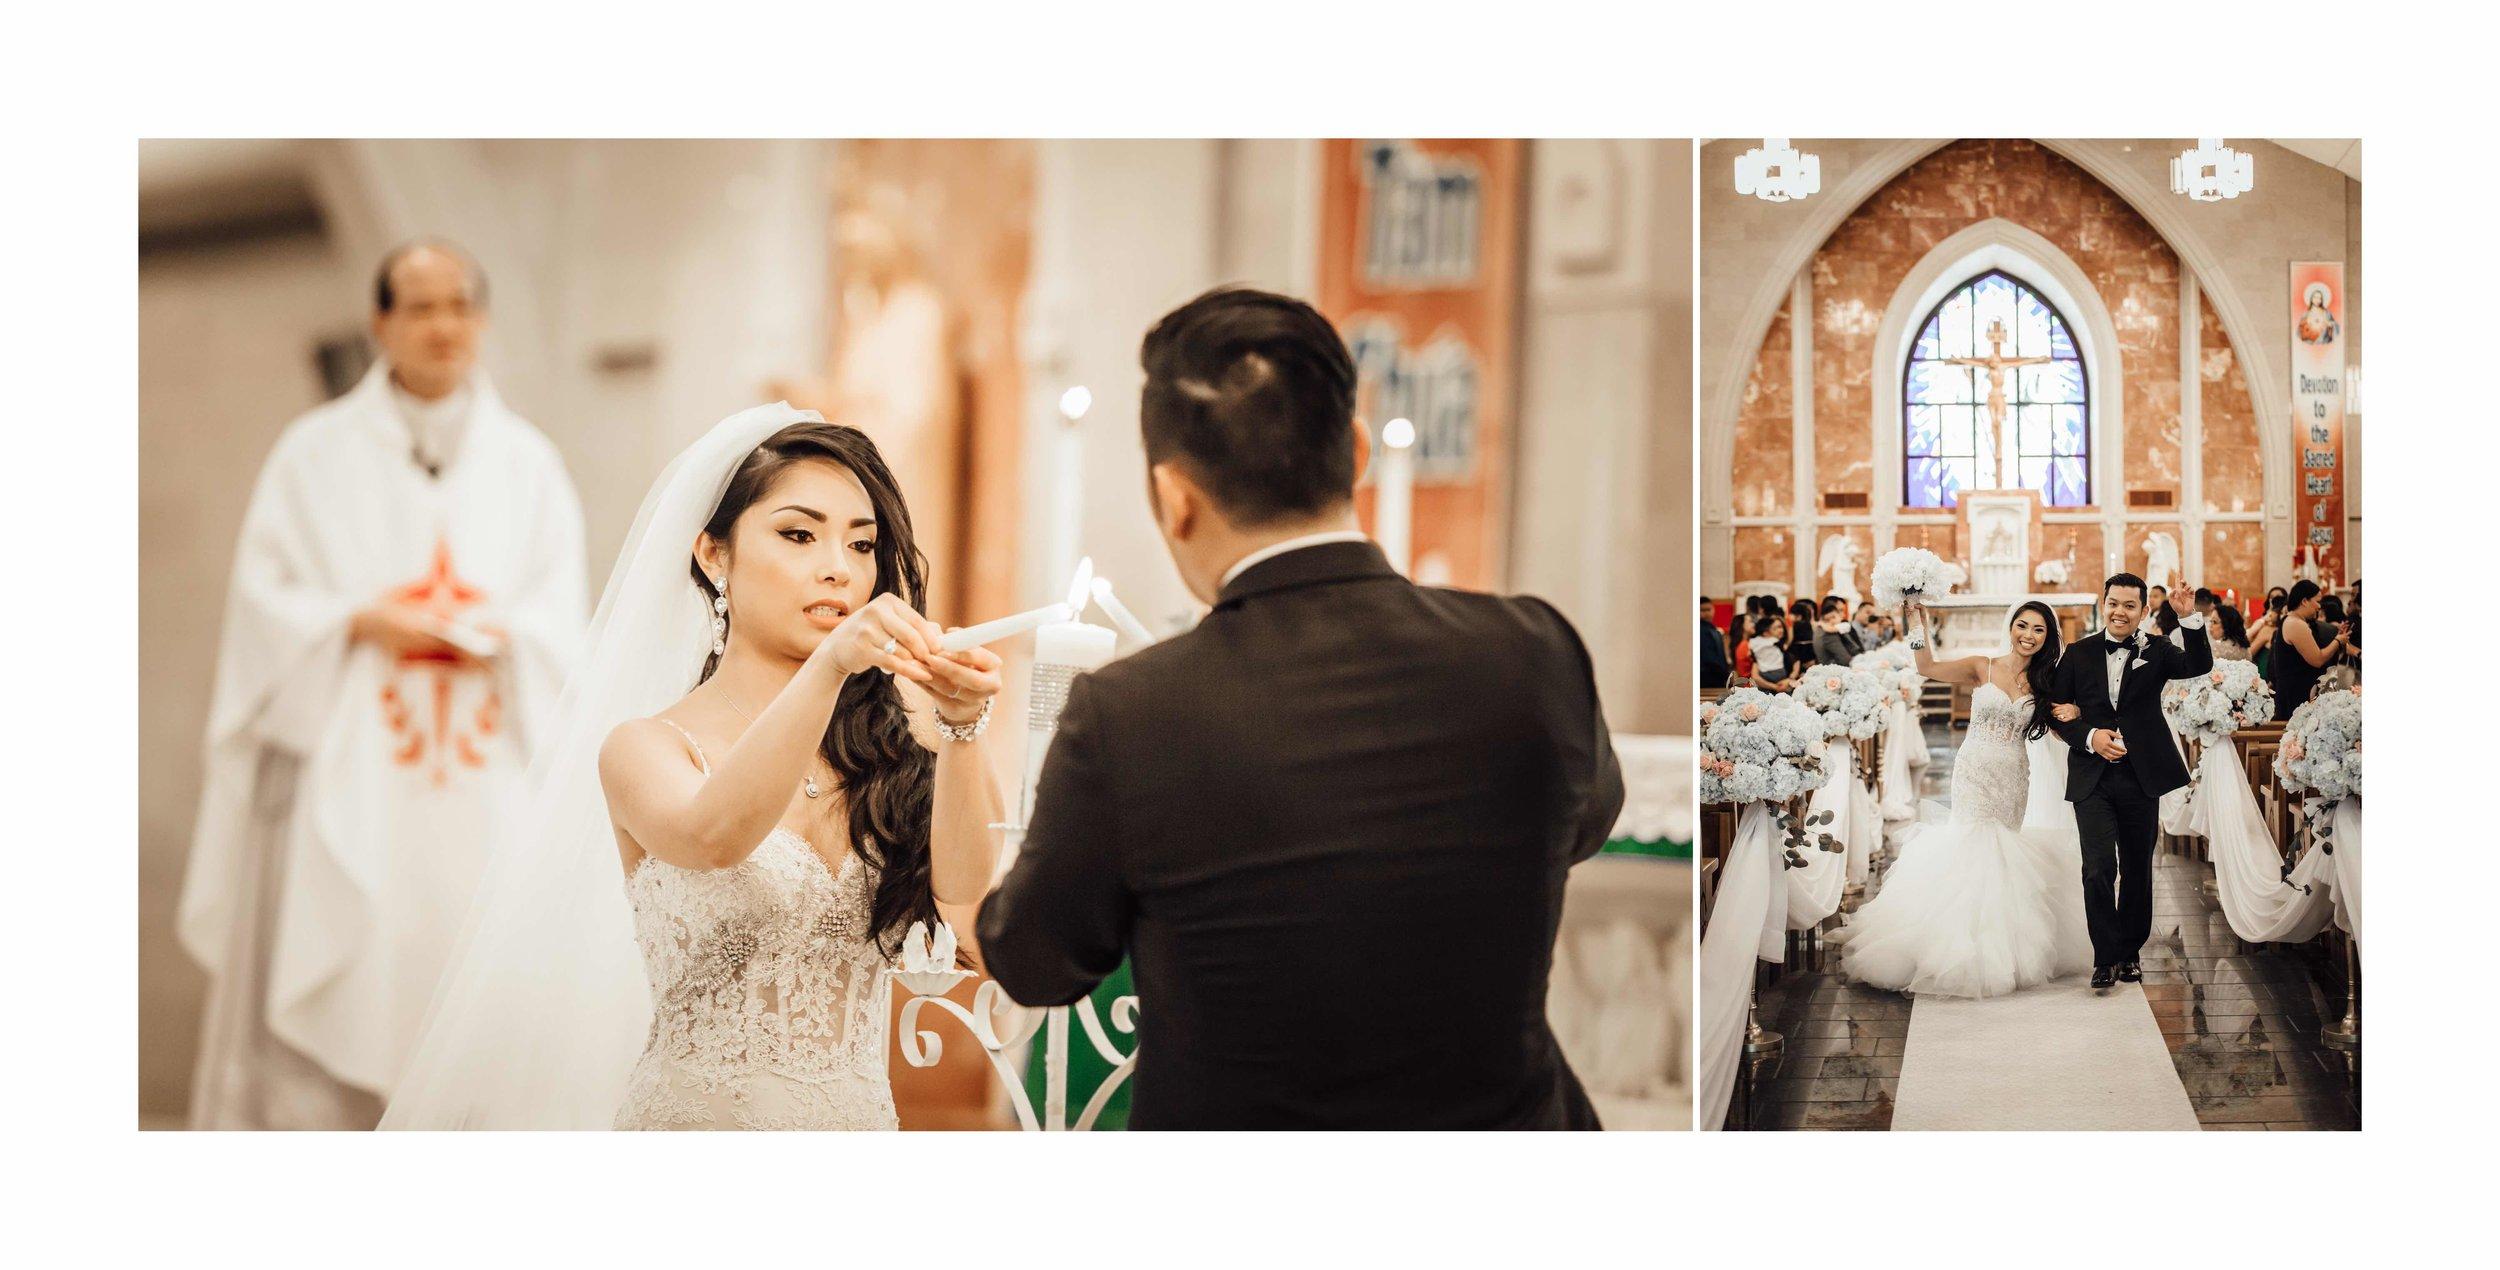 Julie+Tinh_|_Wedding__17.jpg